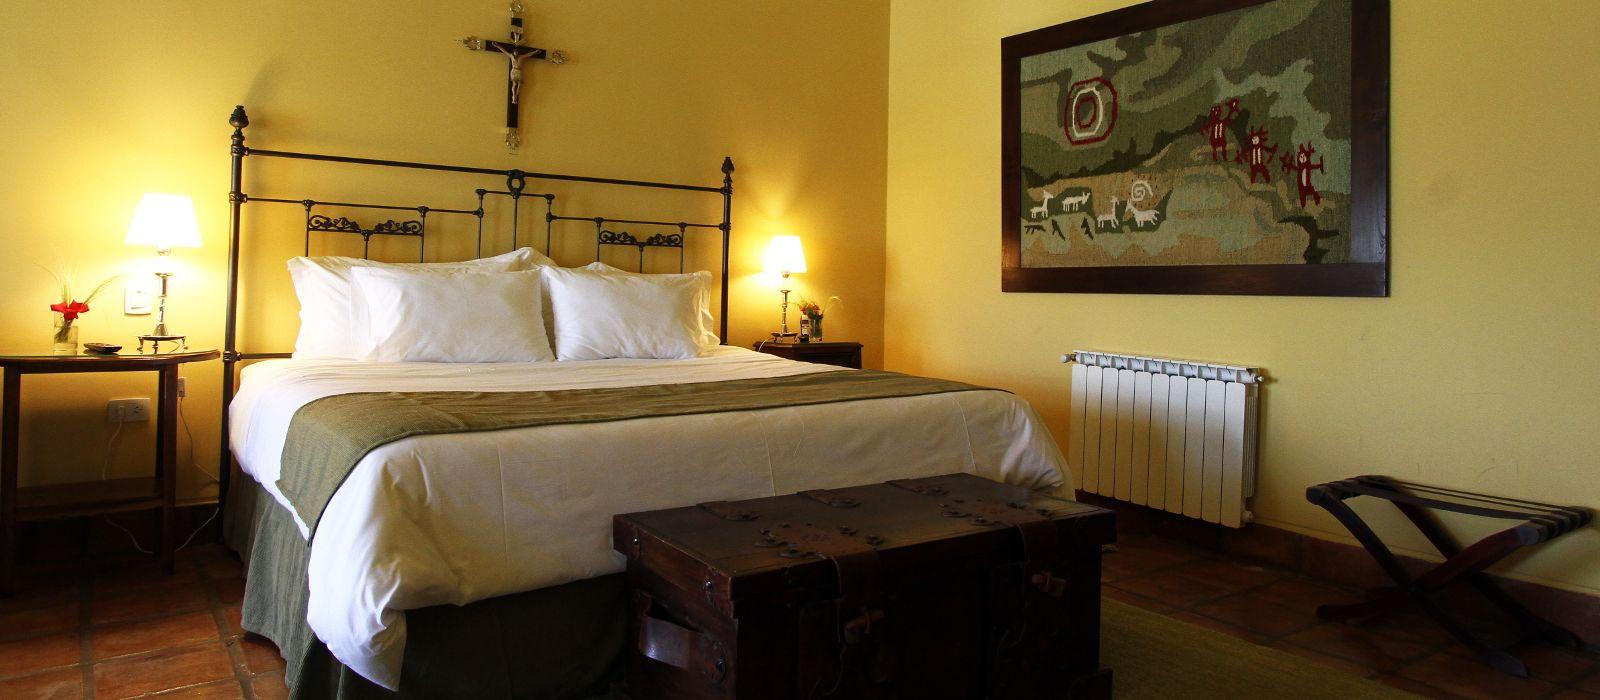 Hotel Patios de Cafayate Argentina